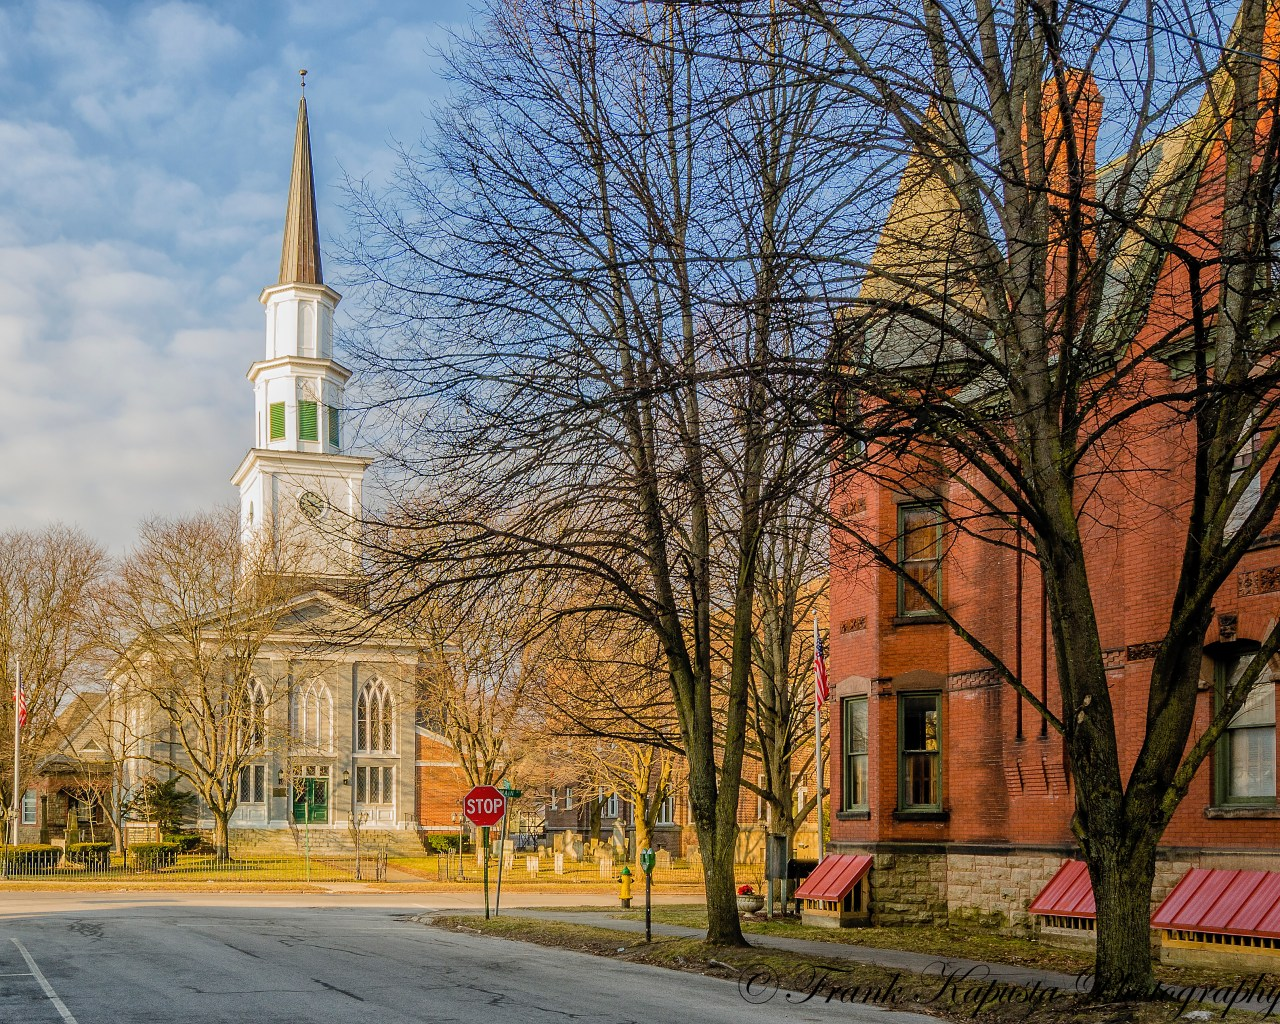 Reformed Church Herkimer NY 2/7/16